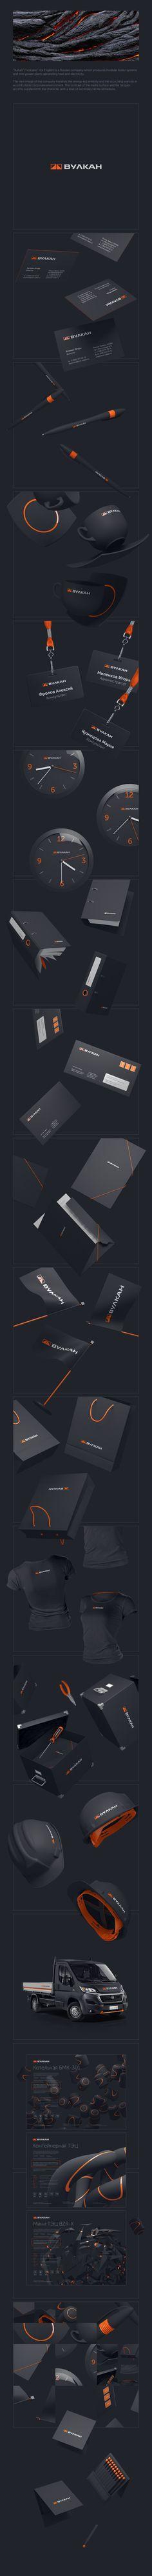 Vulkan by Denis Ulyanov, via Behance #logodesign #logo #logotype #design #branding #logoped #Russia